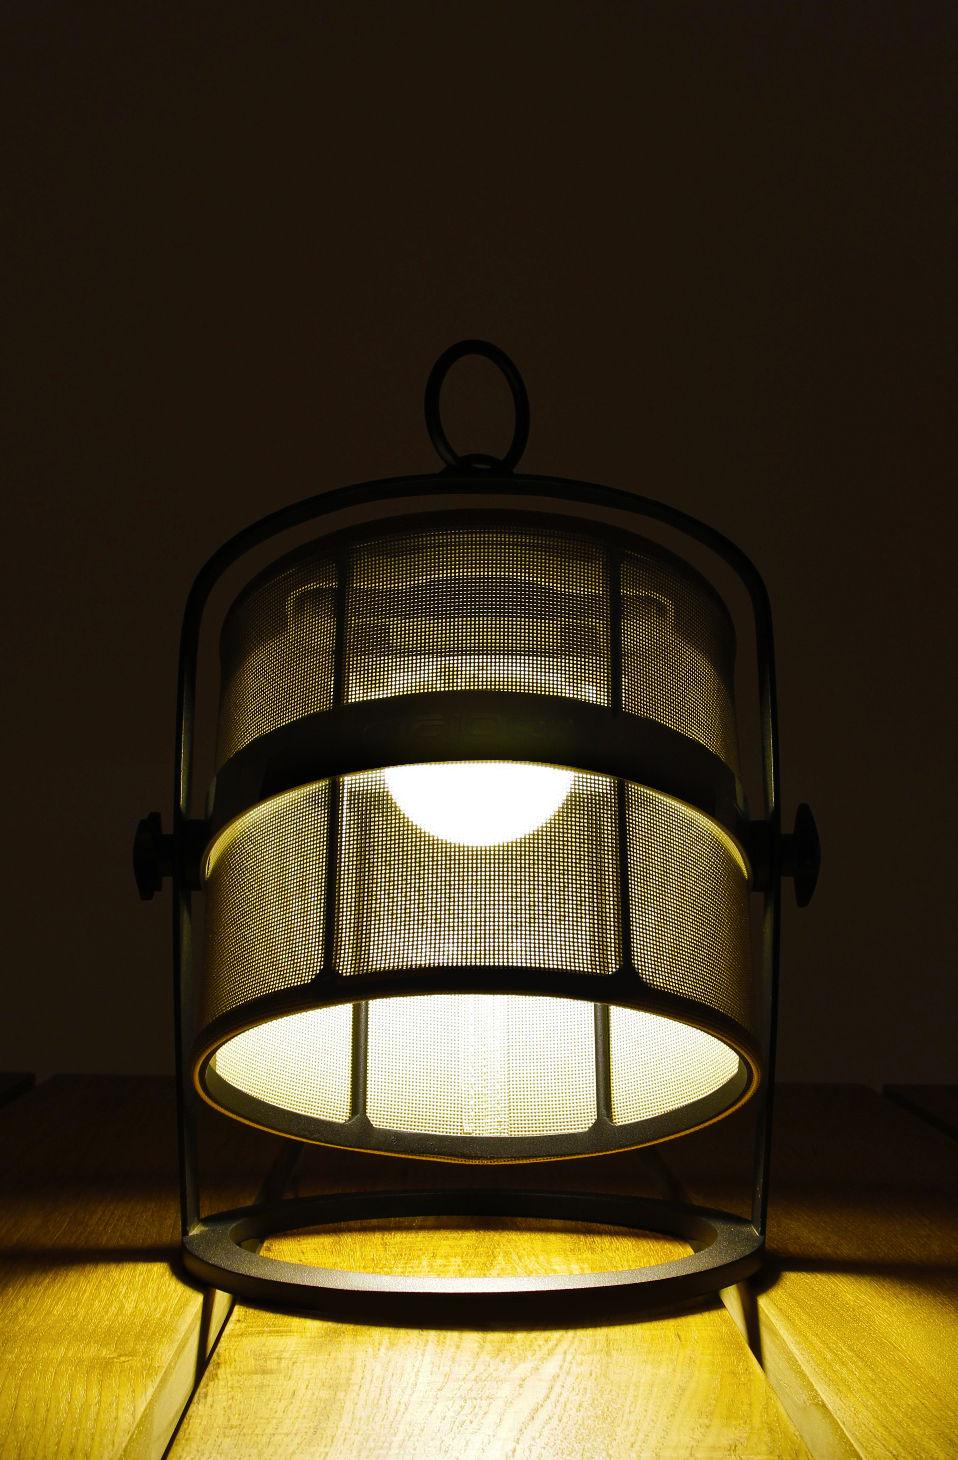 lampe solaire la lampe petite led maiori blanc. Black Bedroom Furniture Sets. Home Design Ideas